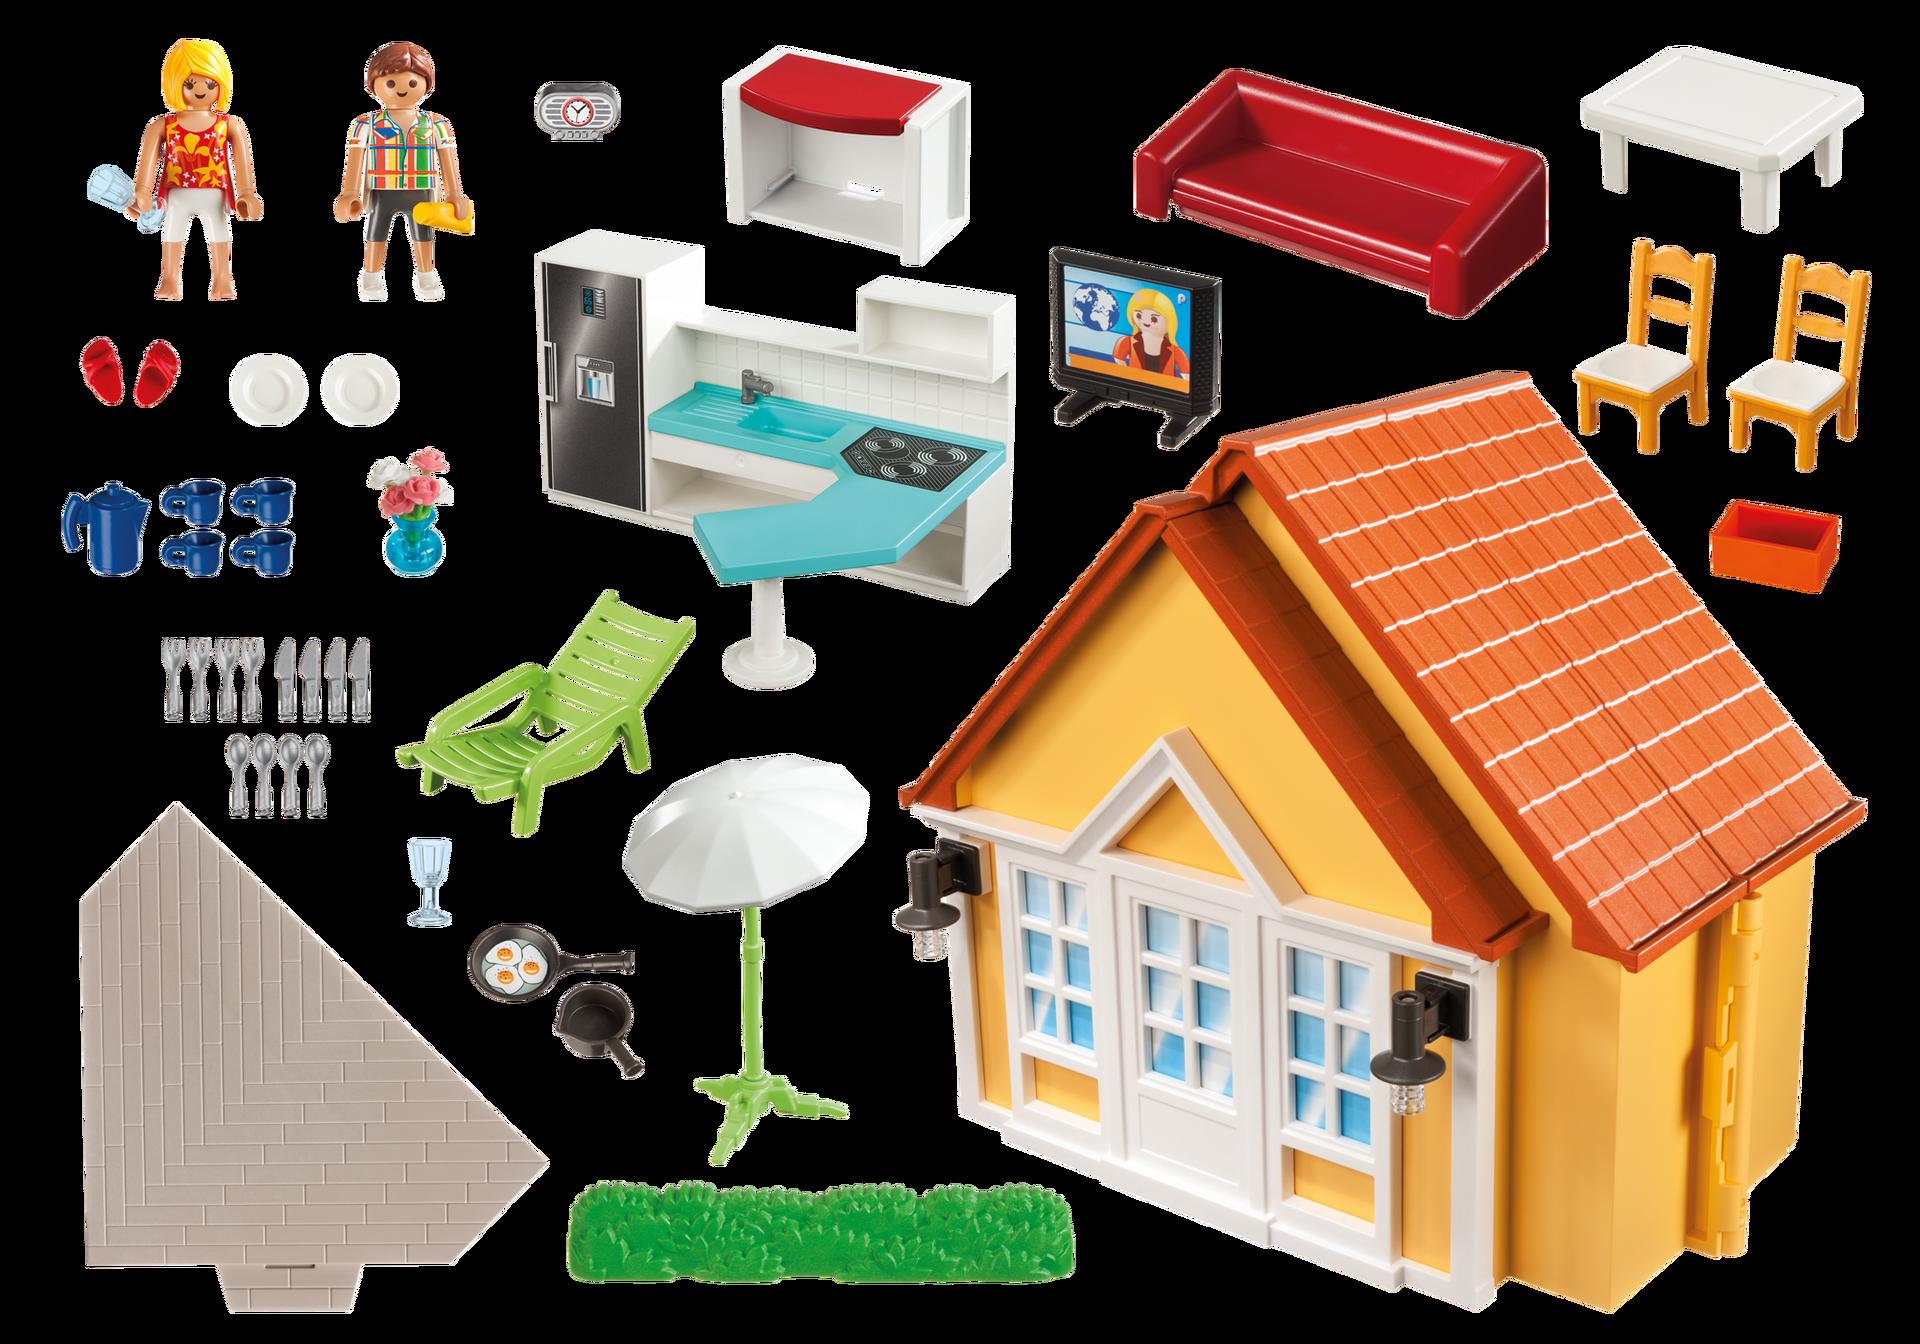 Casa de campo malet n 6020 playmobil espa a for Casa maletin playmobil